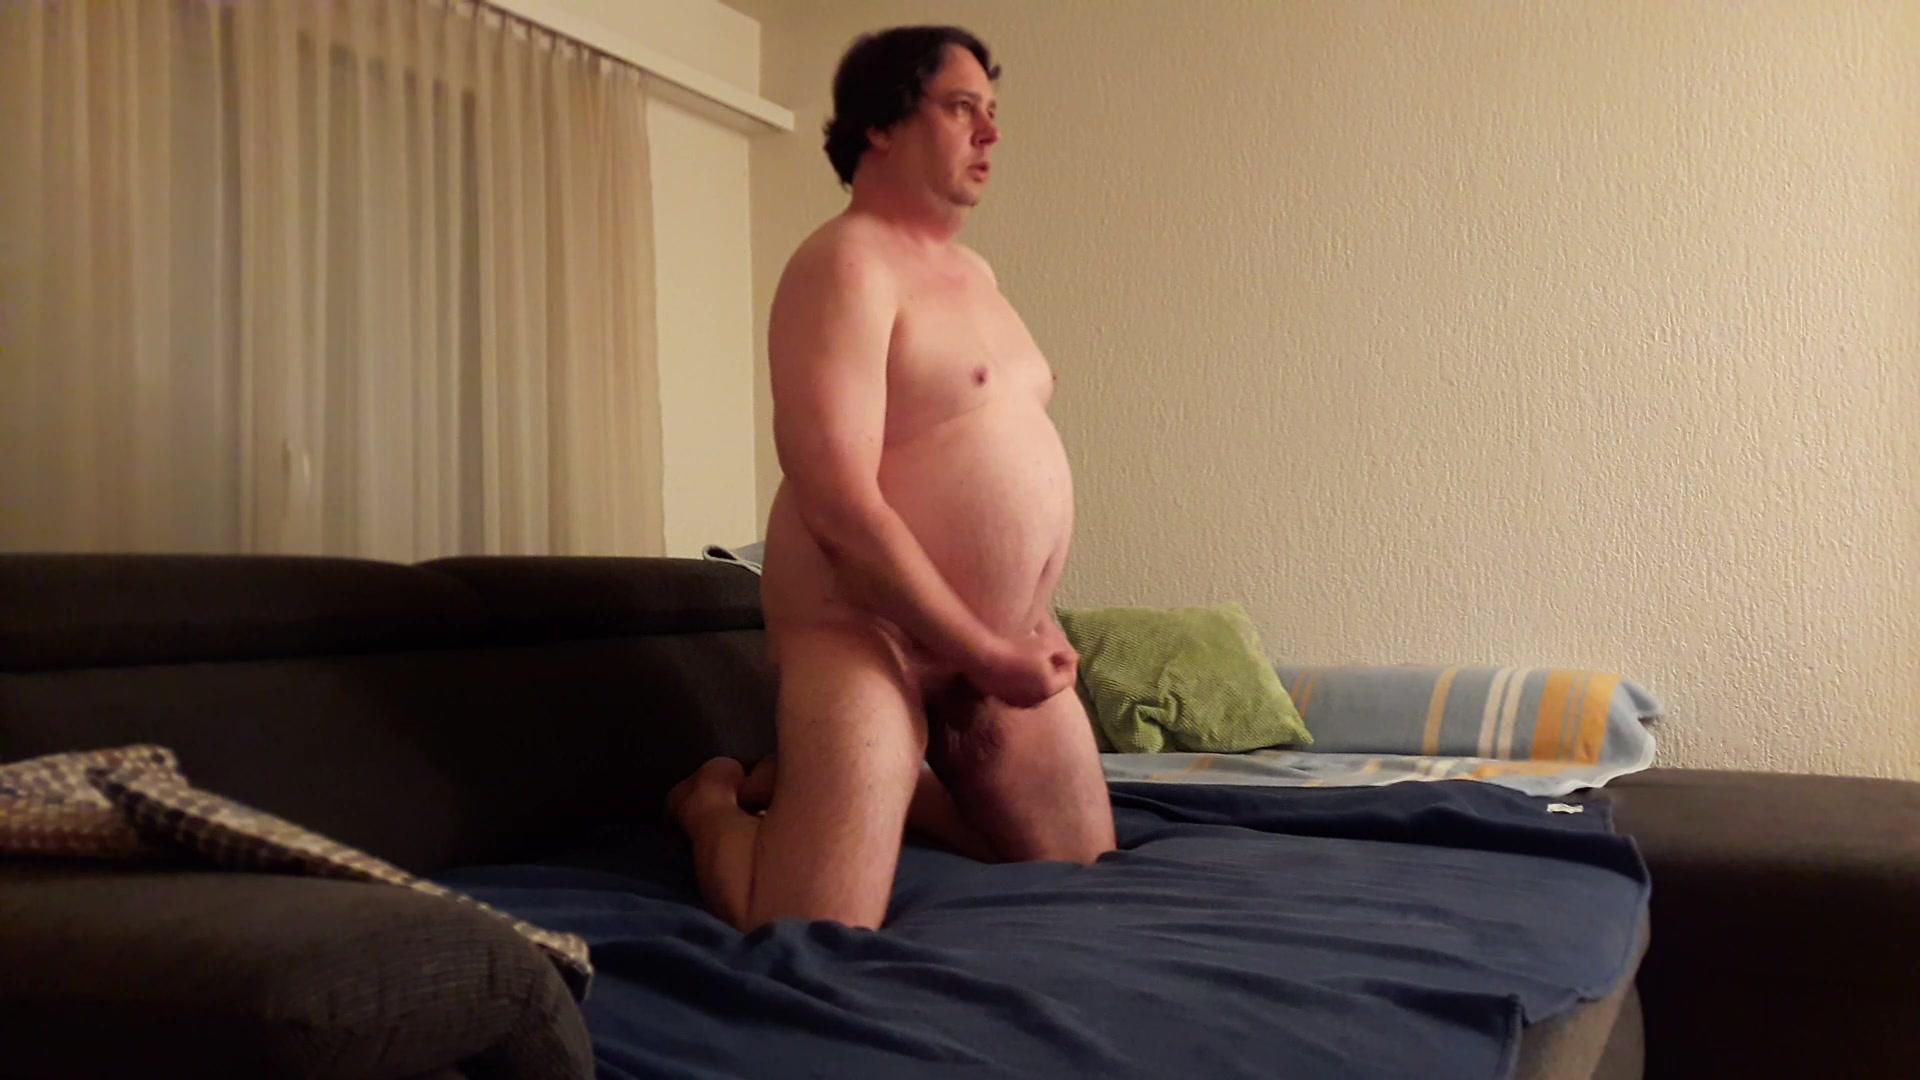 Wichsprotokoll 1.2 Milf porn pics